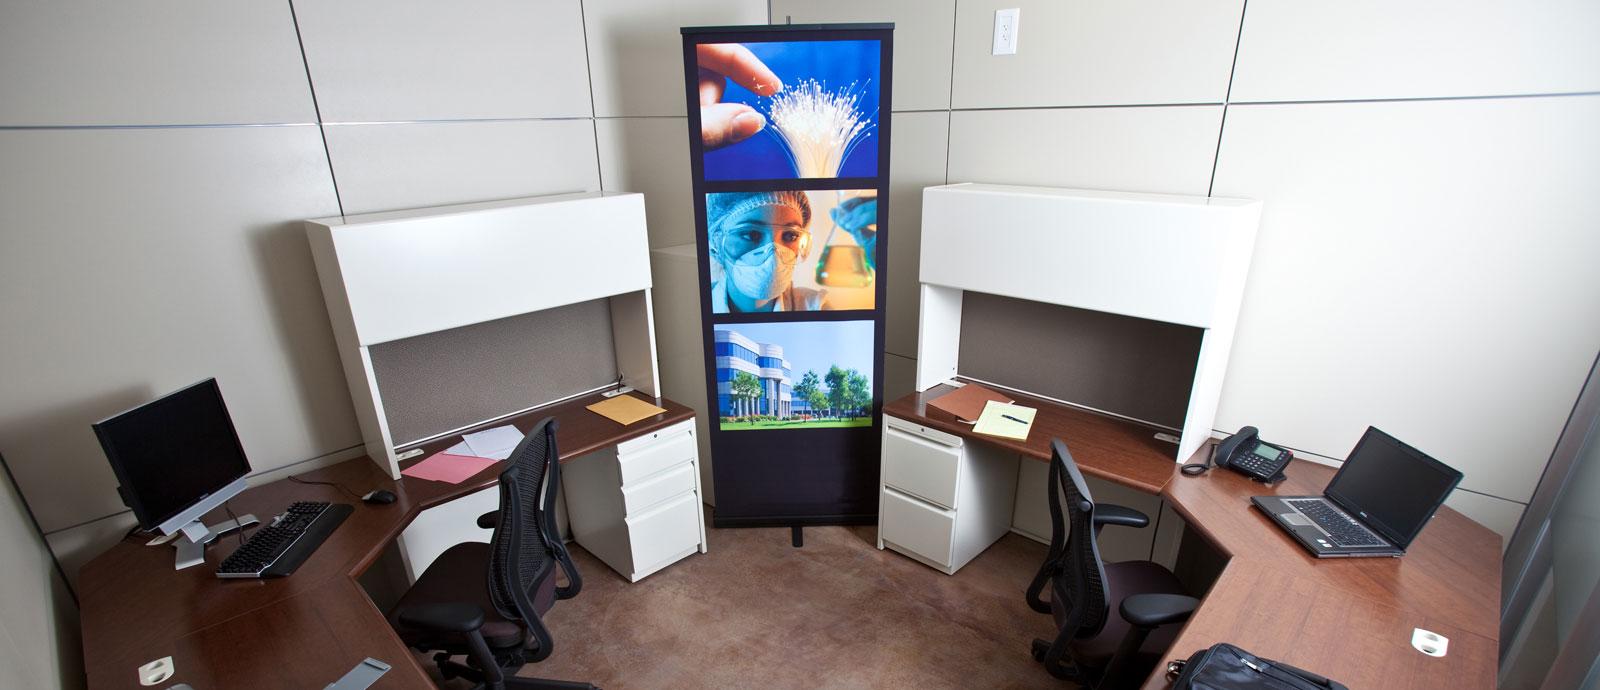 JEDCO Business Innovation Center